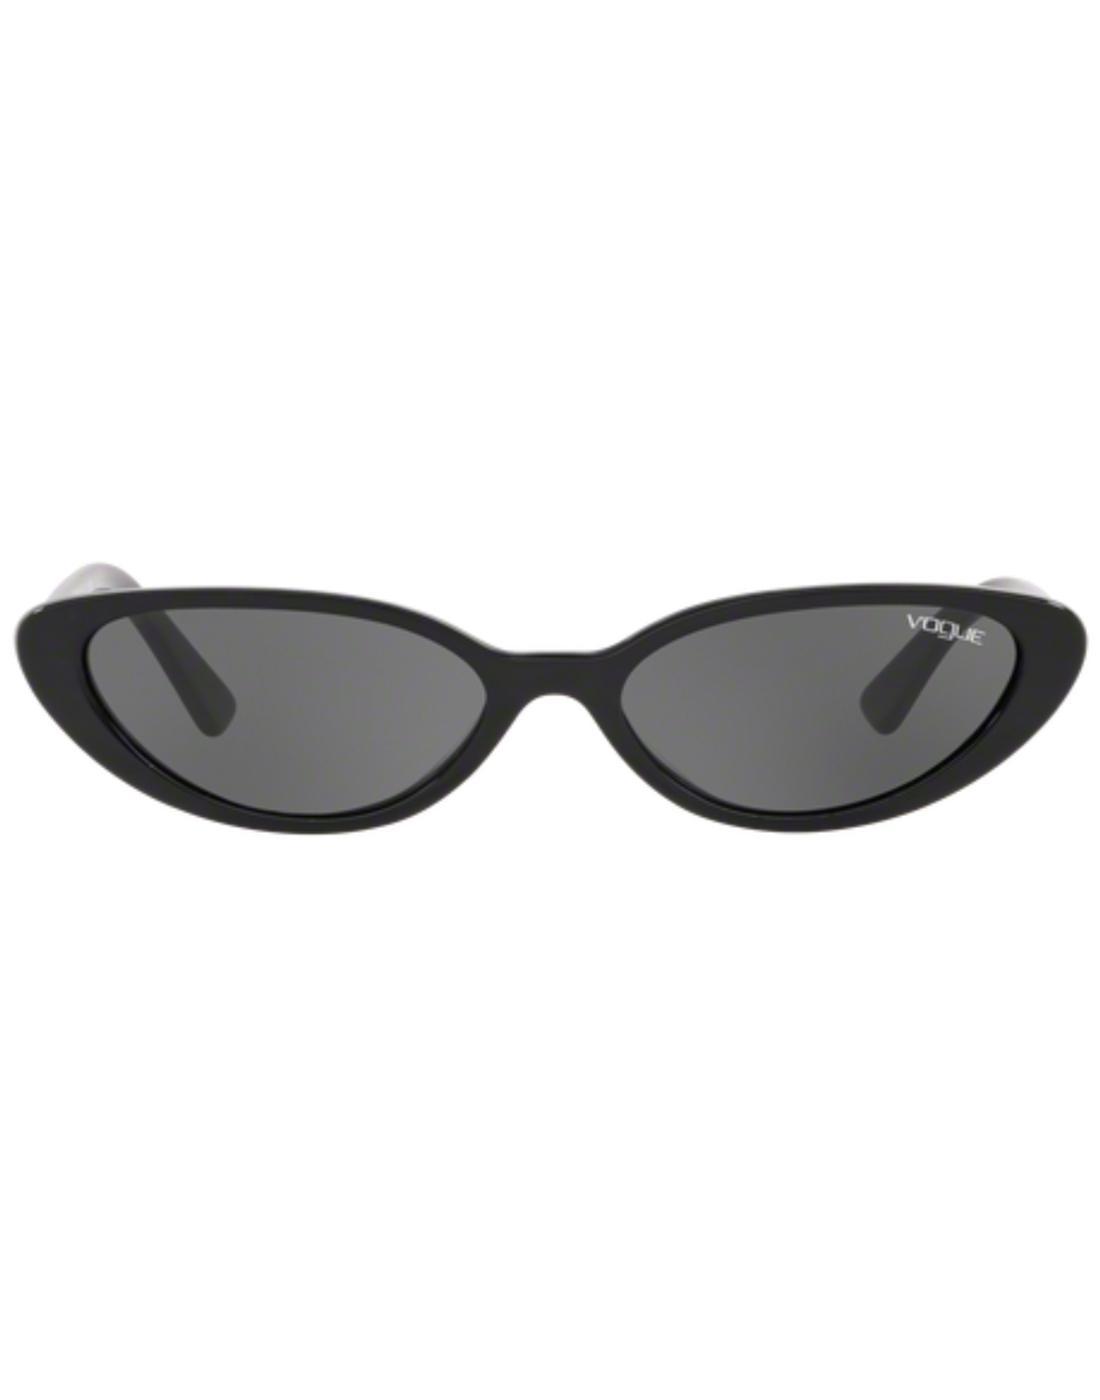 VOGUE Gigi Hadid Retro 50s Cats-eye Sunglasses Blk